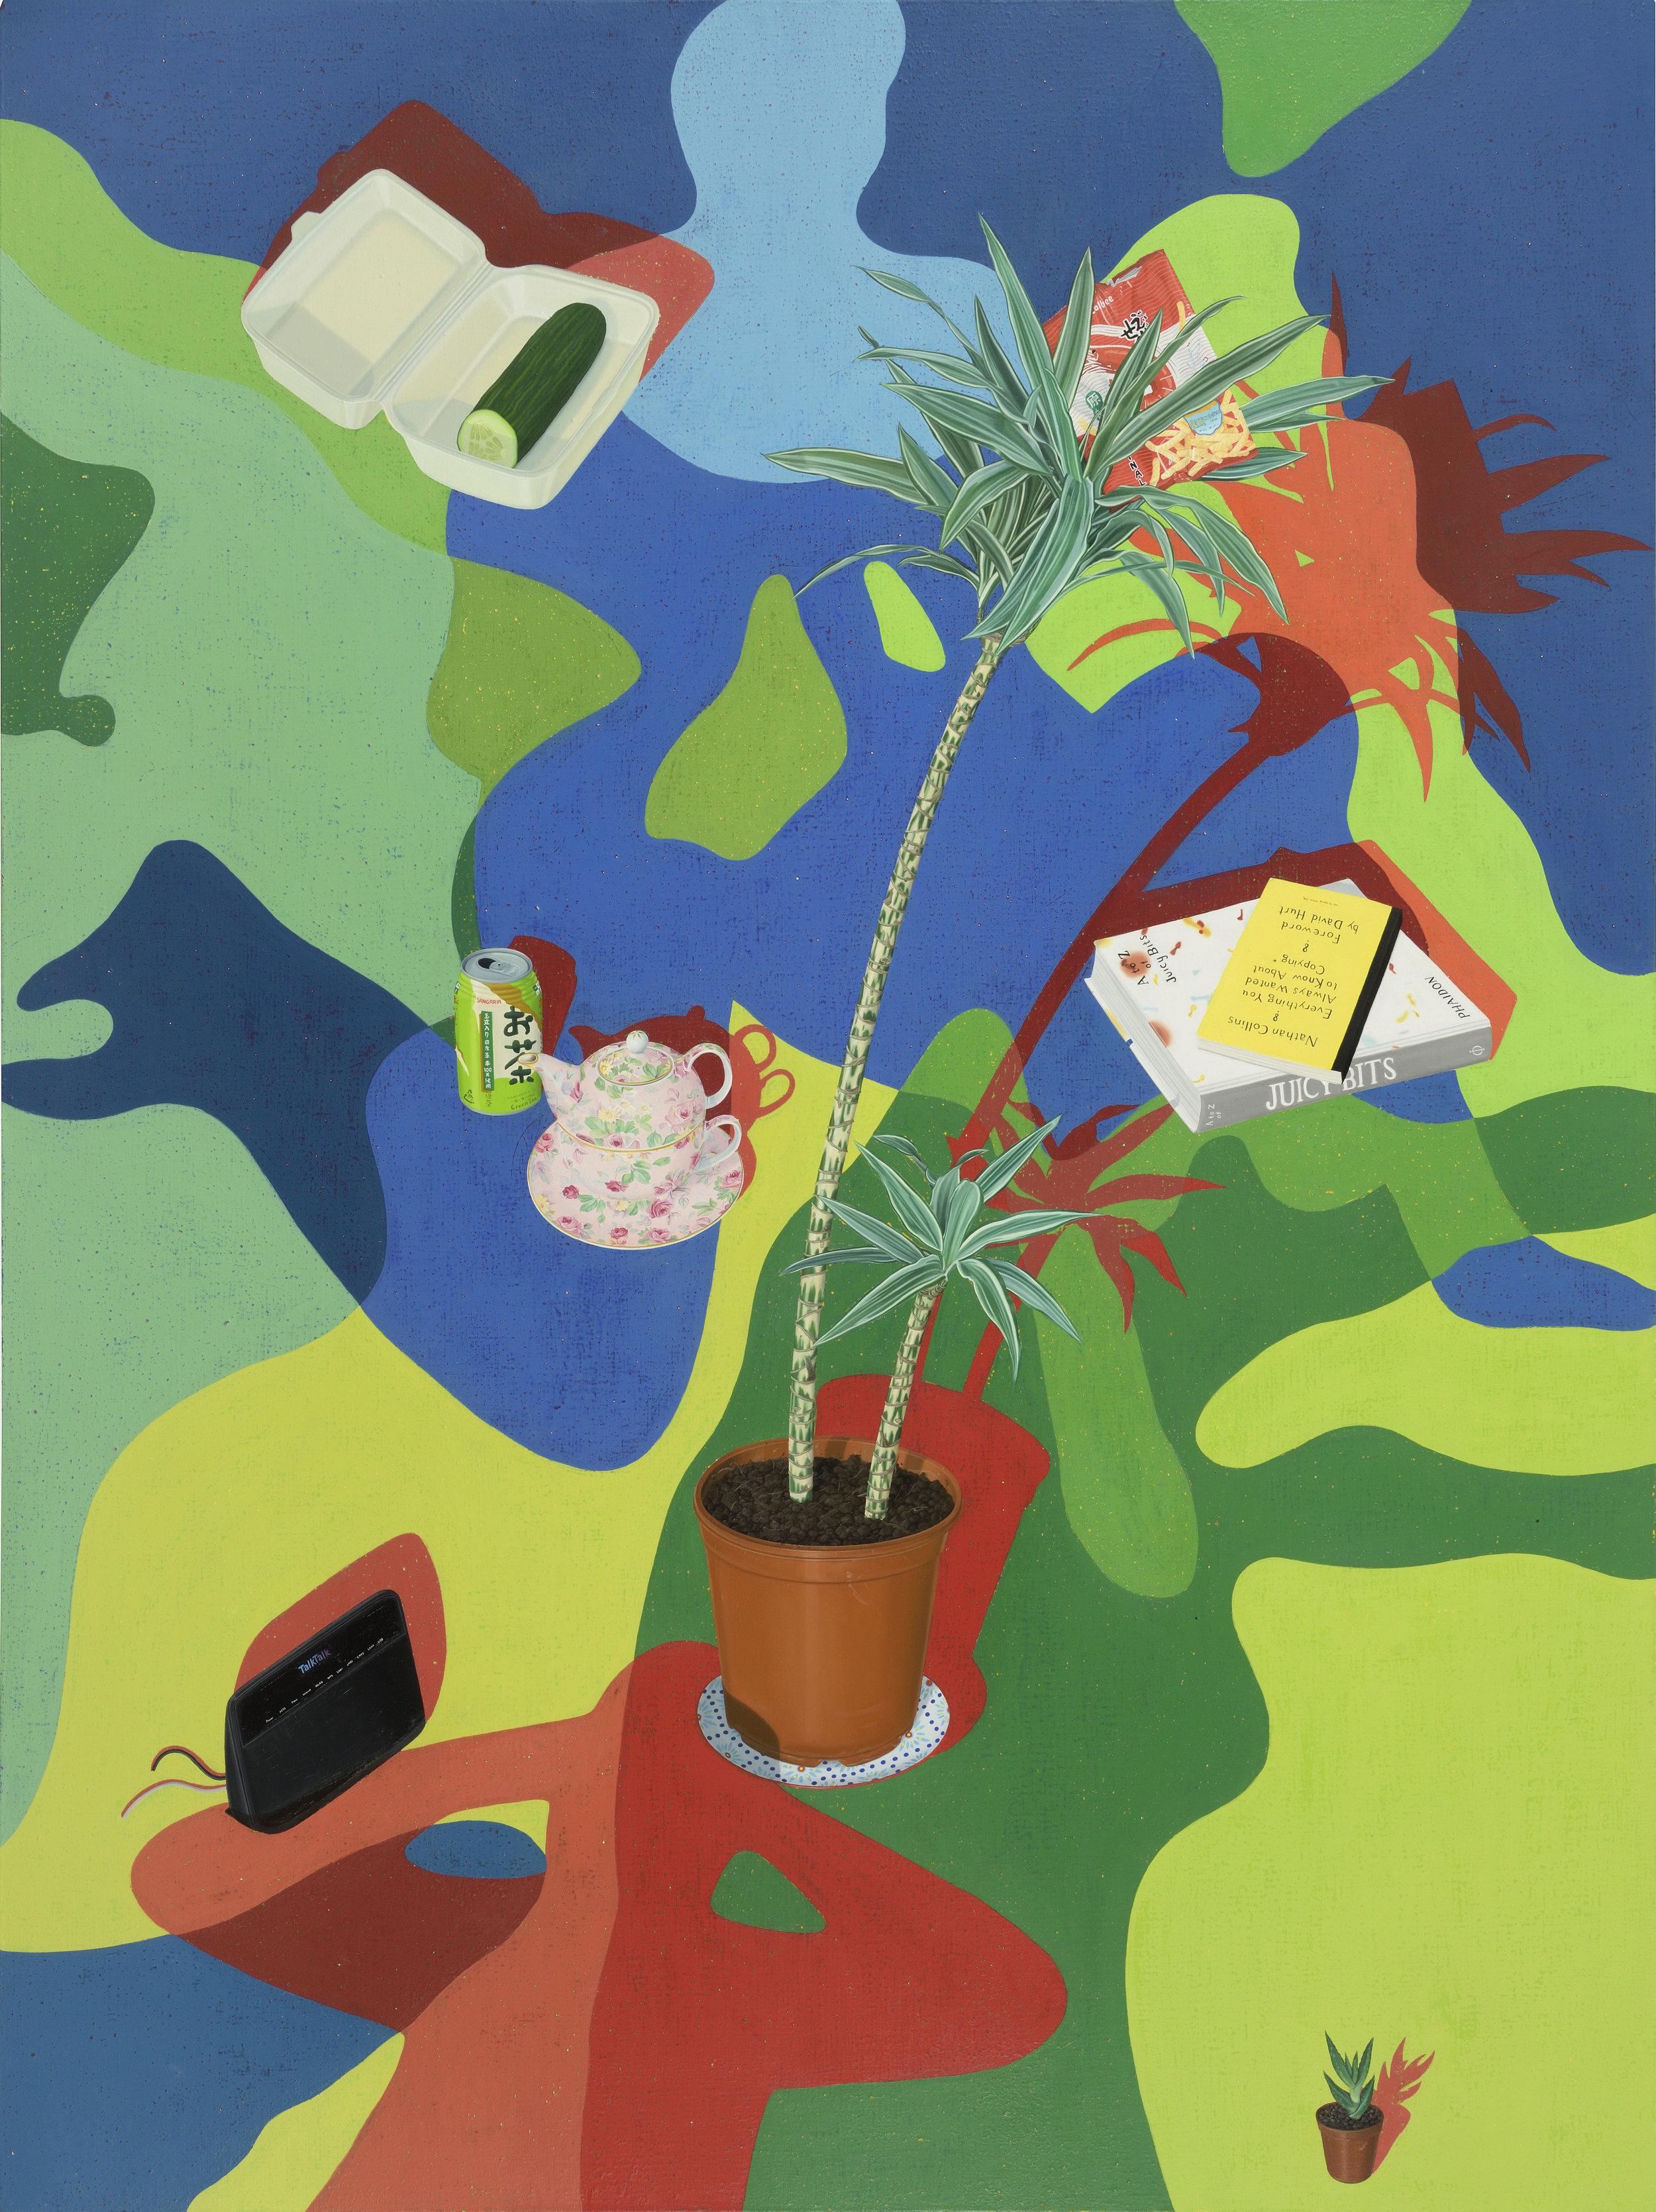 Tristan Pigott  Juicy Bits , 2017 Oil on linen 160 x 120 cm